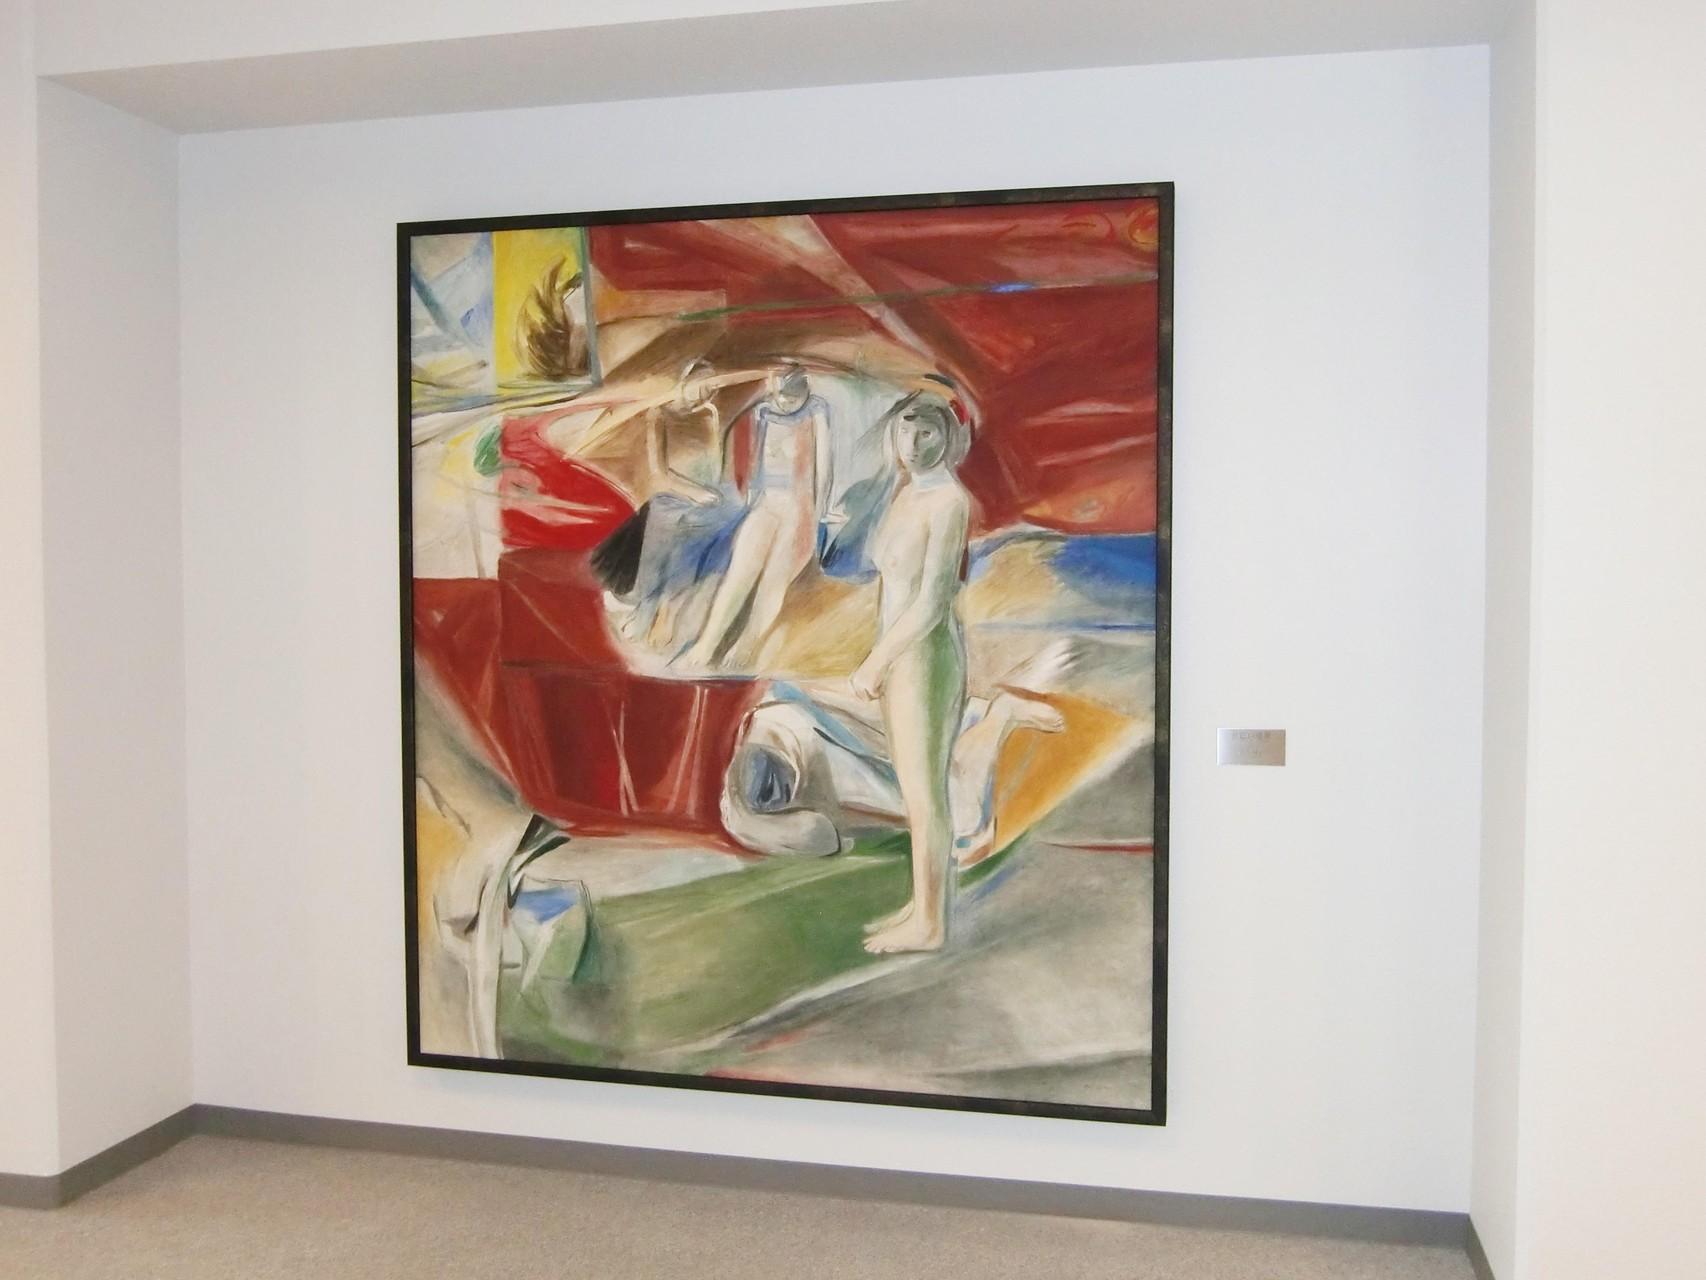 「黄色い遠景」 185×165cm フレスコ 個展 1985年 山添耕治 京都芸大 名誉教授